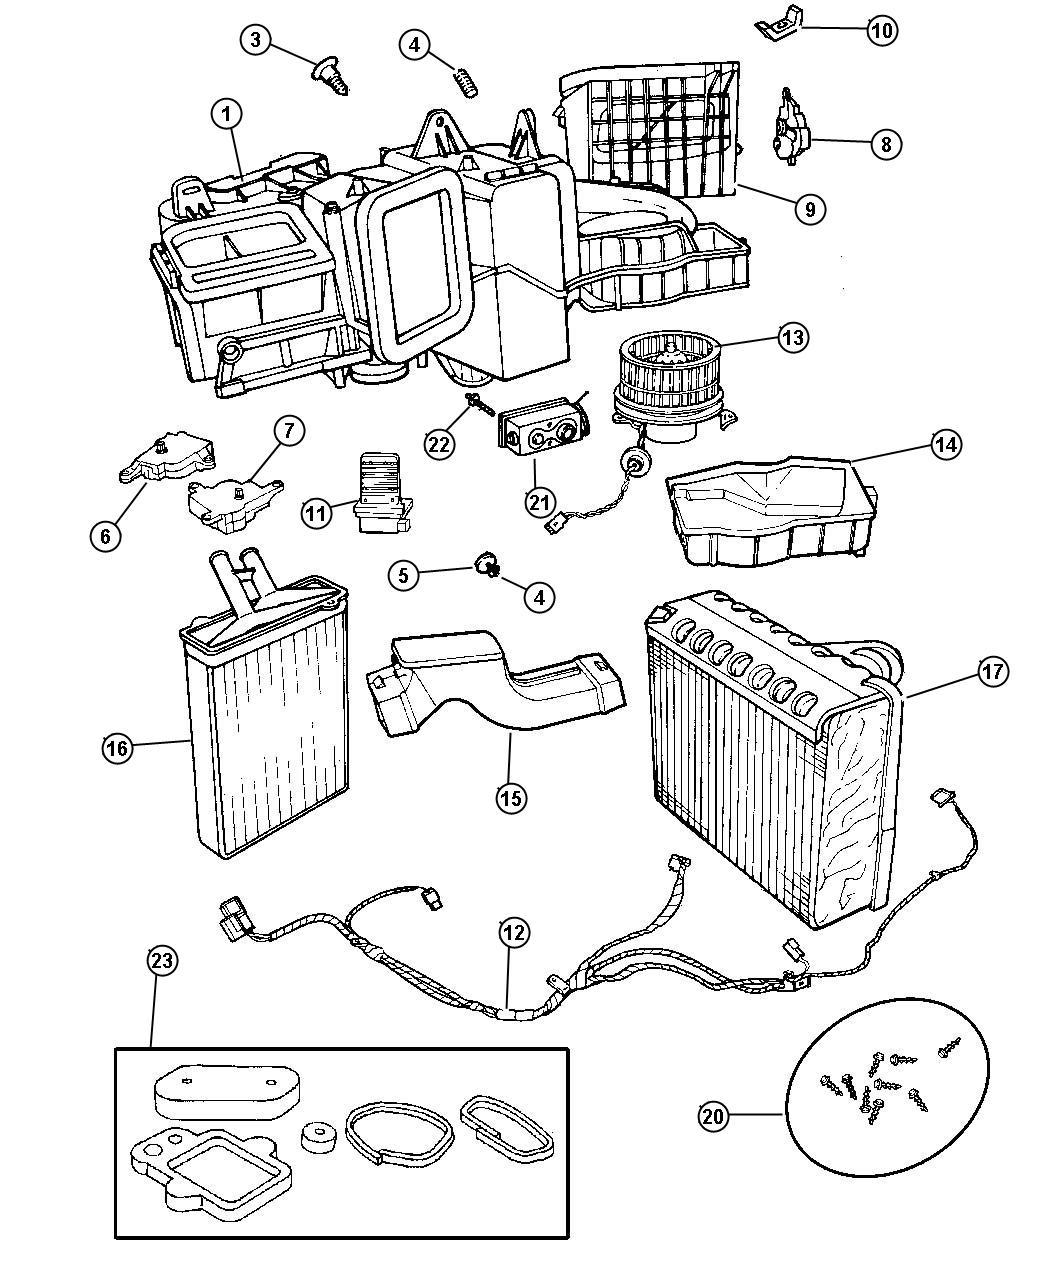 Chrysler Lhs Air Conditioning Unit